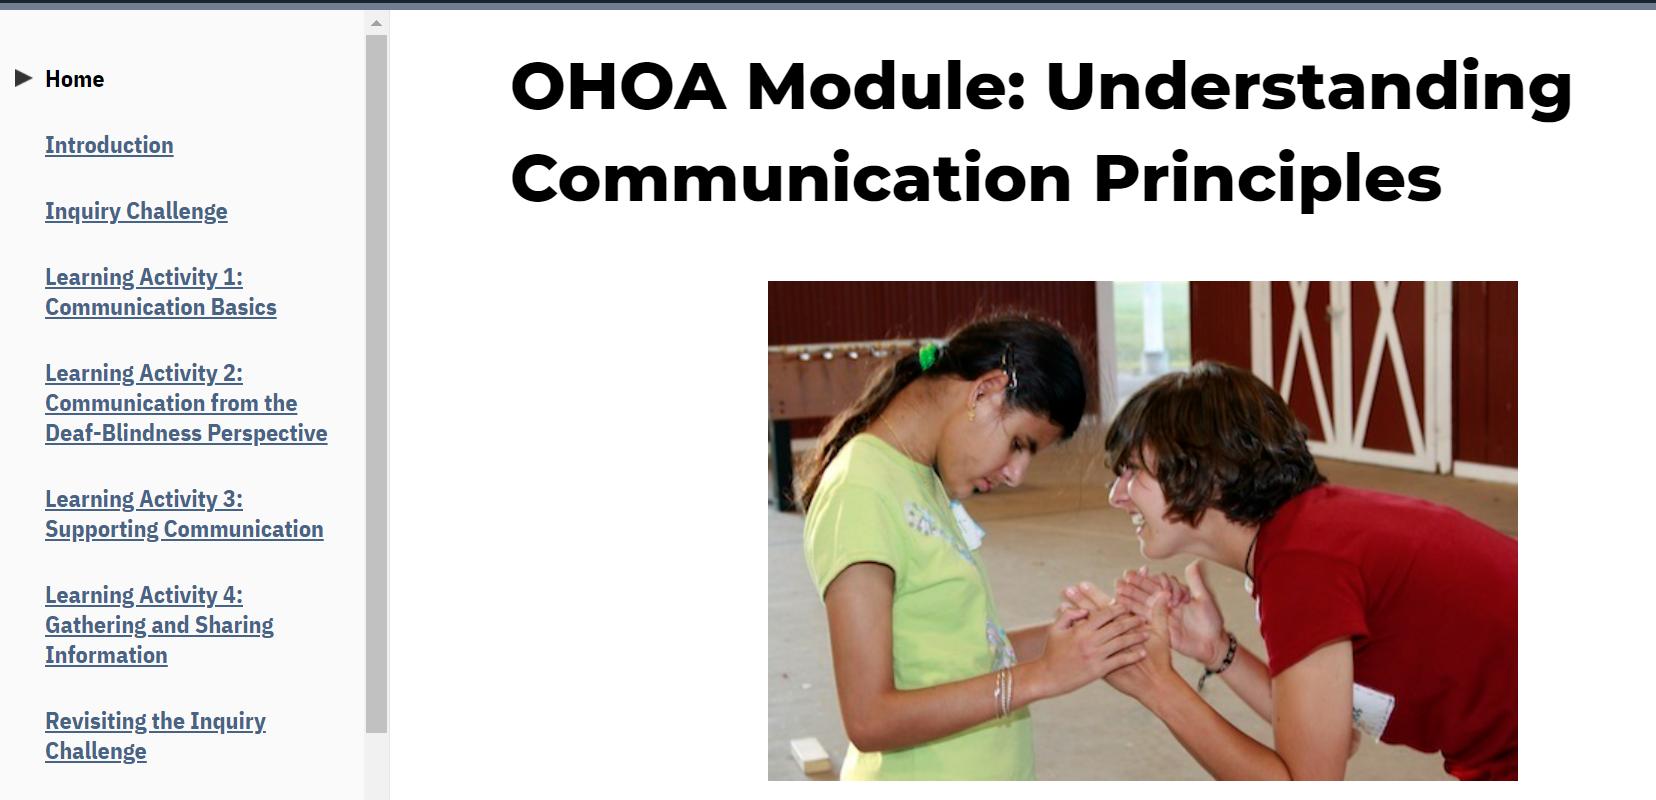 Screenshot from the OHOA MOdule: Using Communication Principles